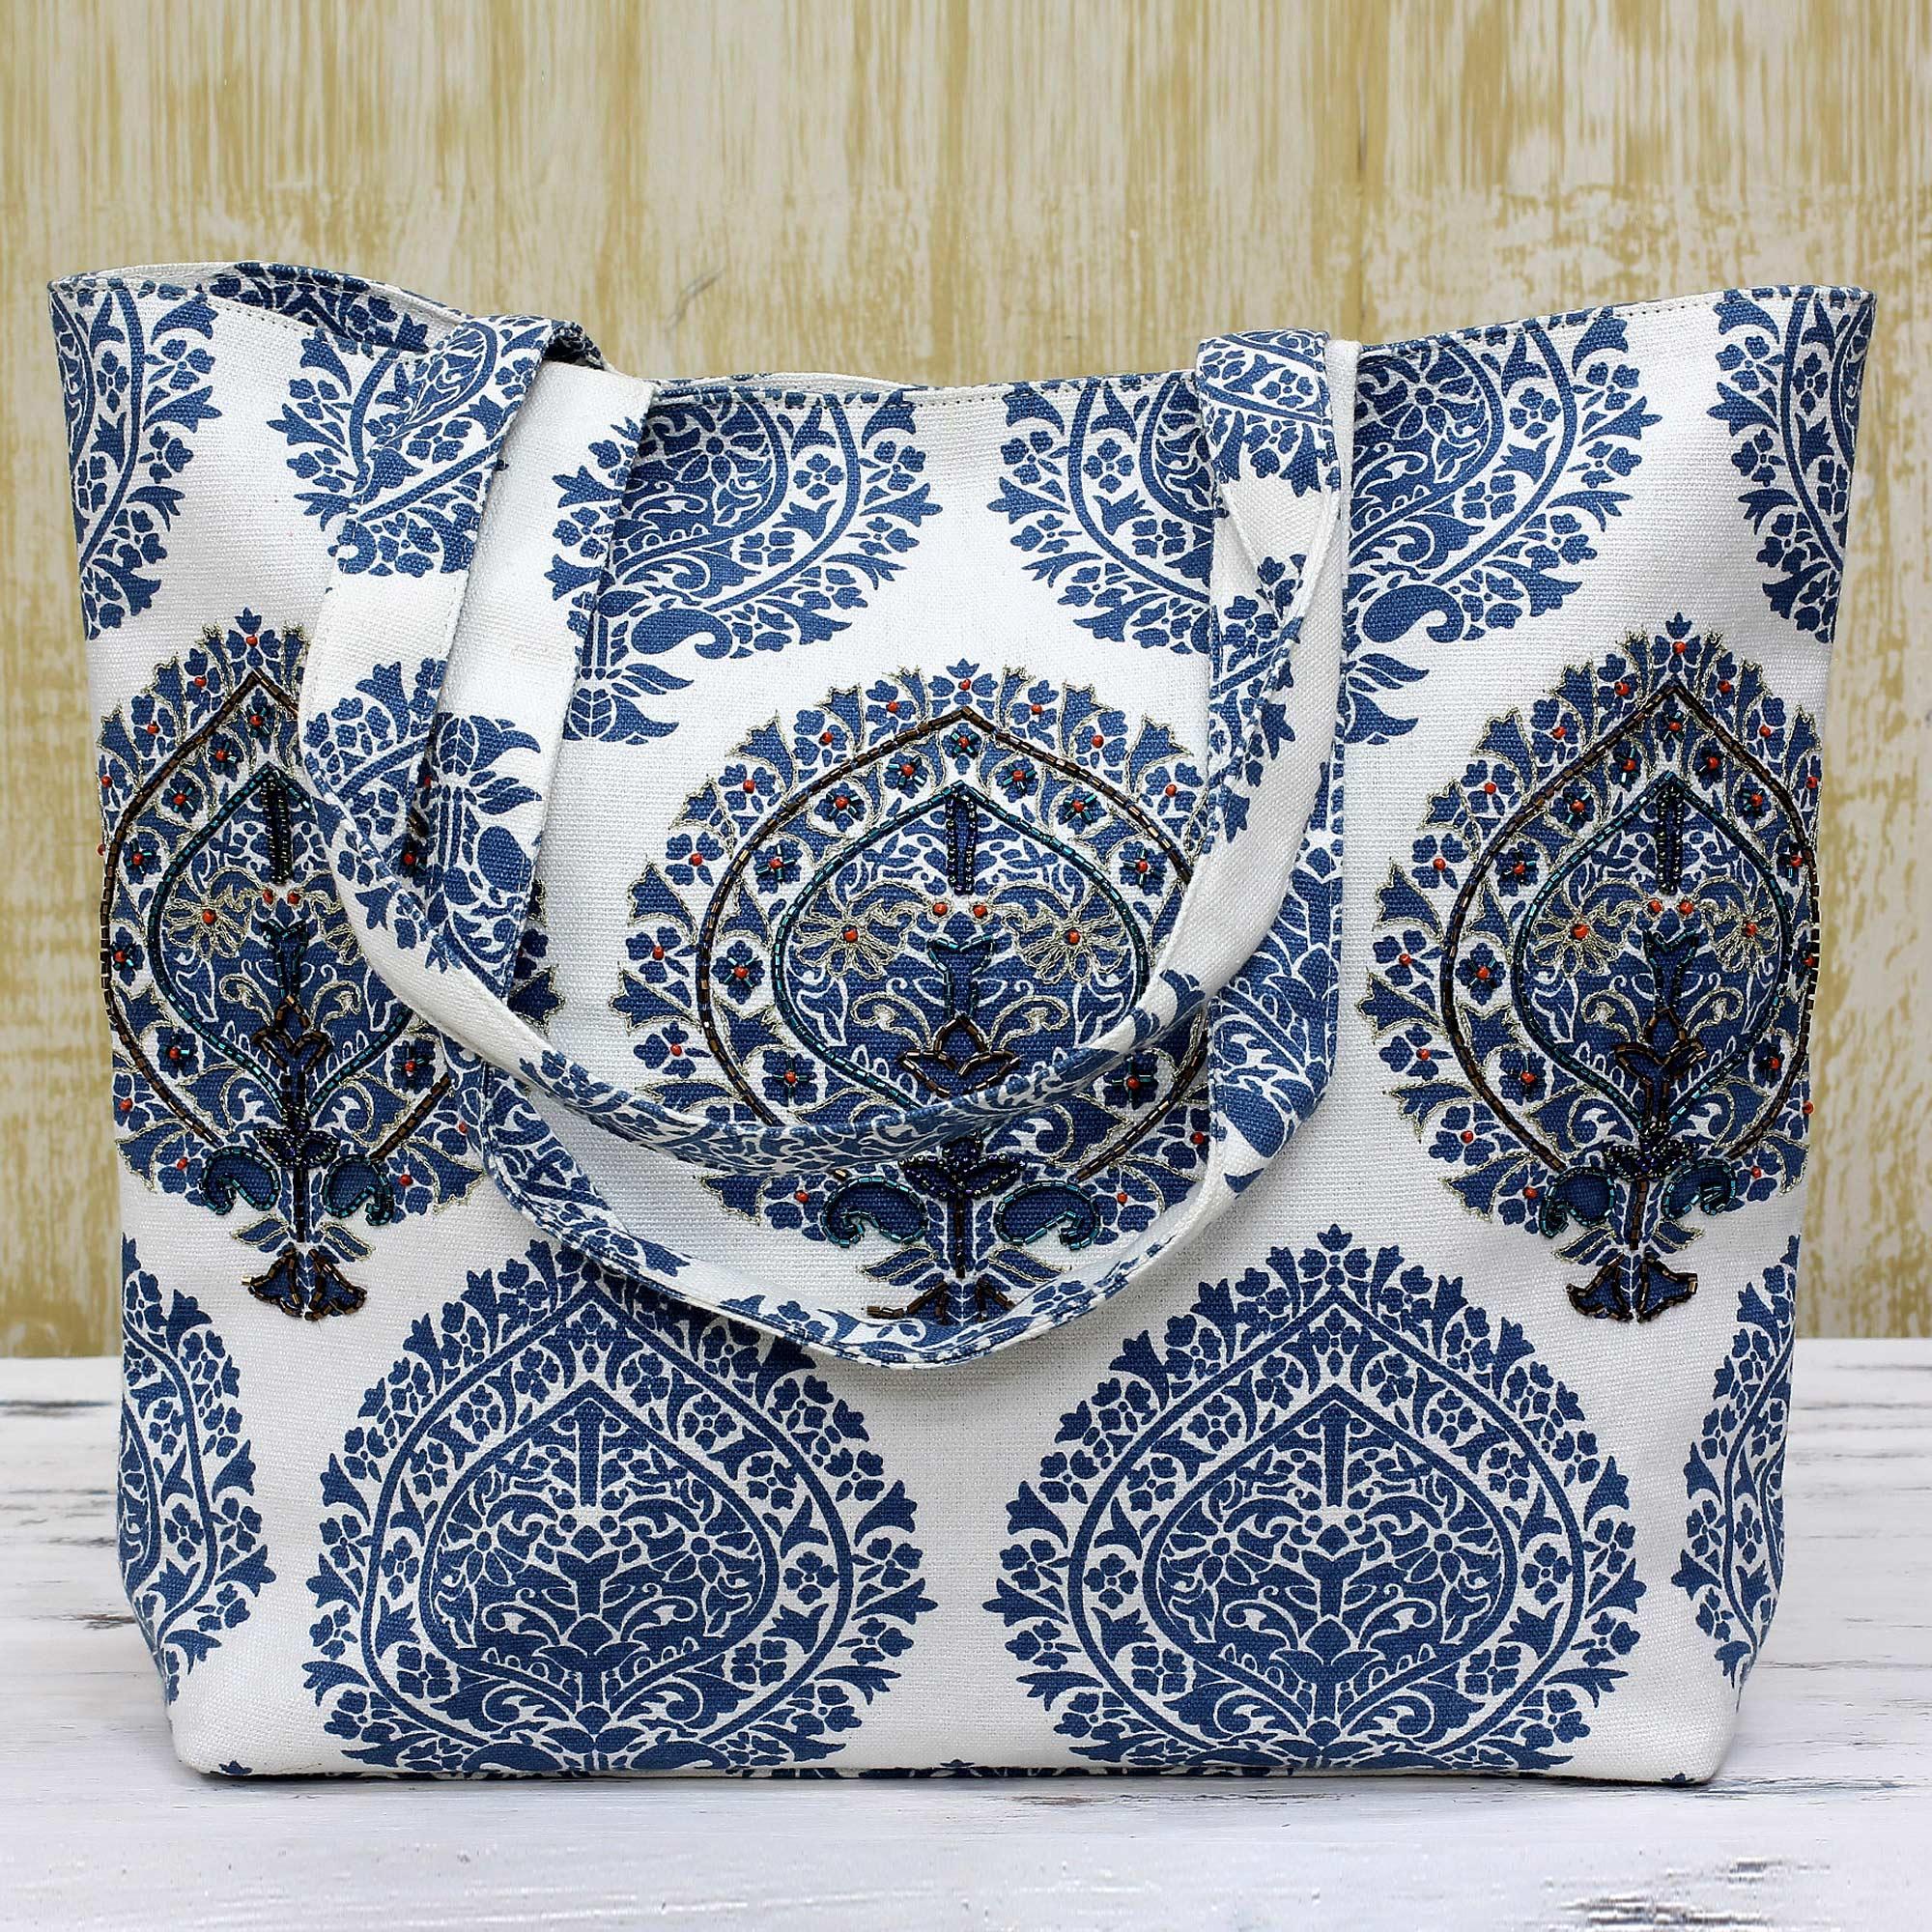 Grandiose Azure Zari Embroidered Cotton Tote Handbag from India blue eggshell white